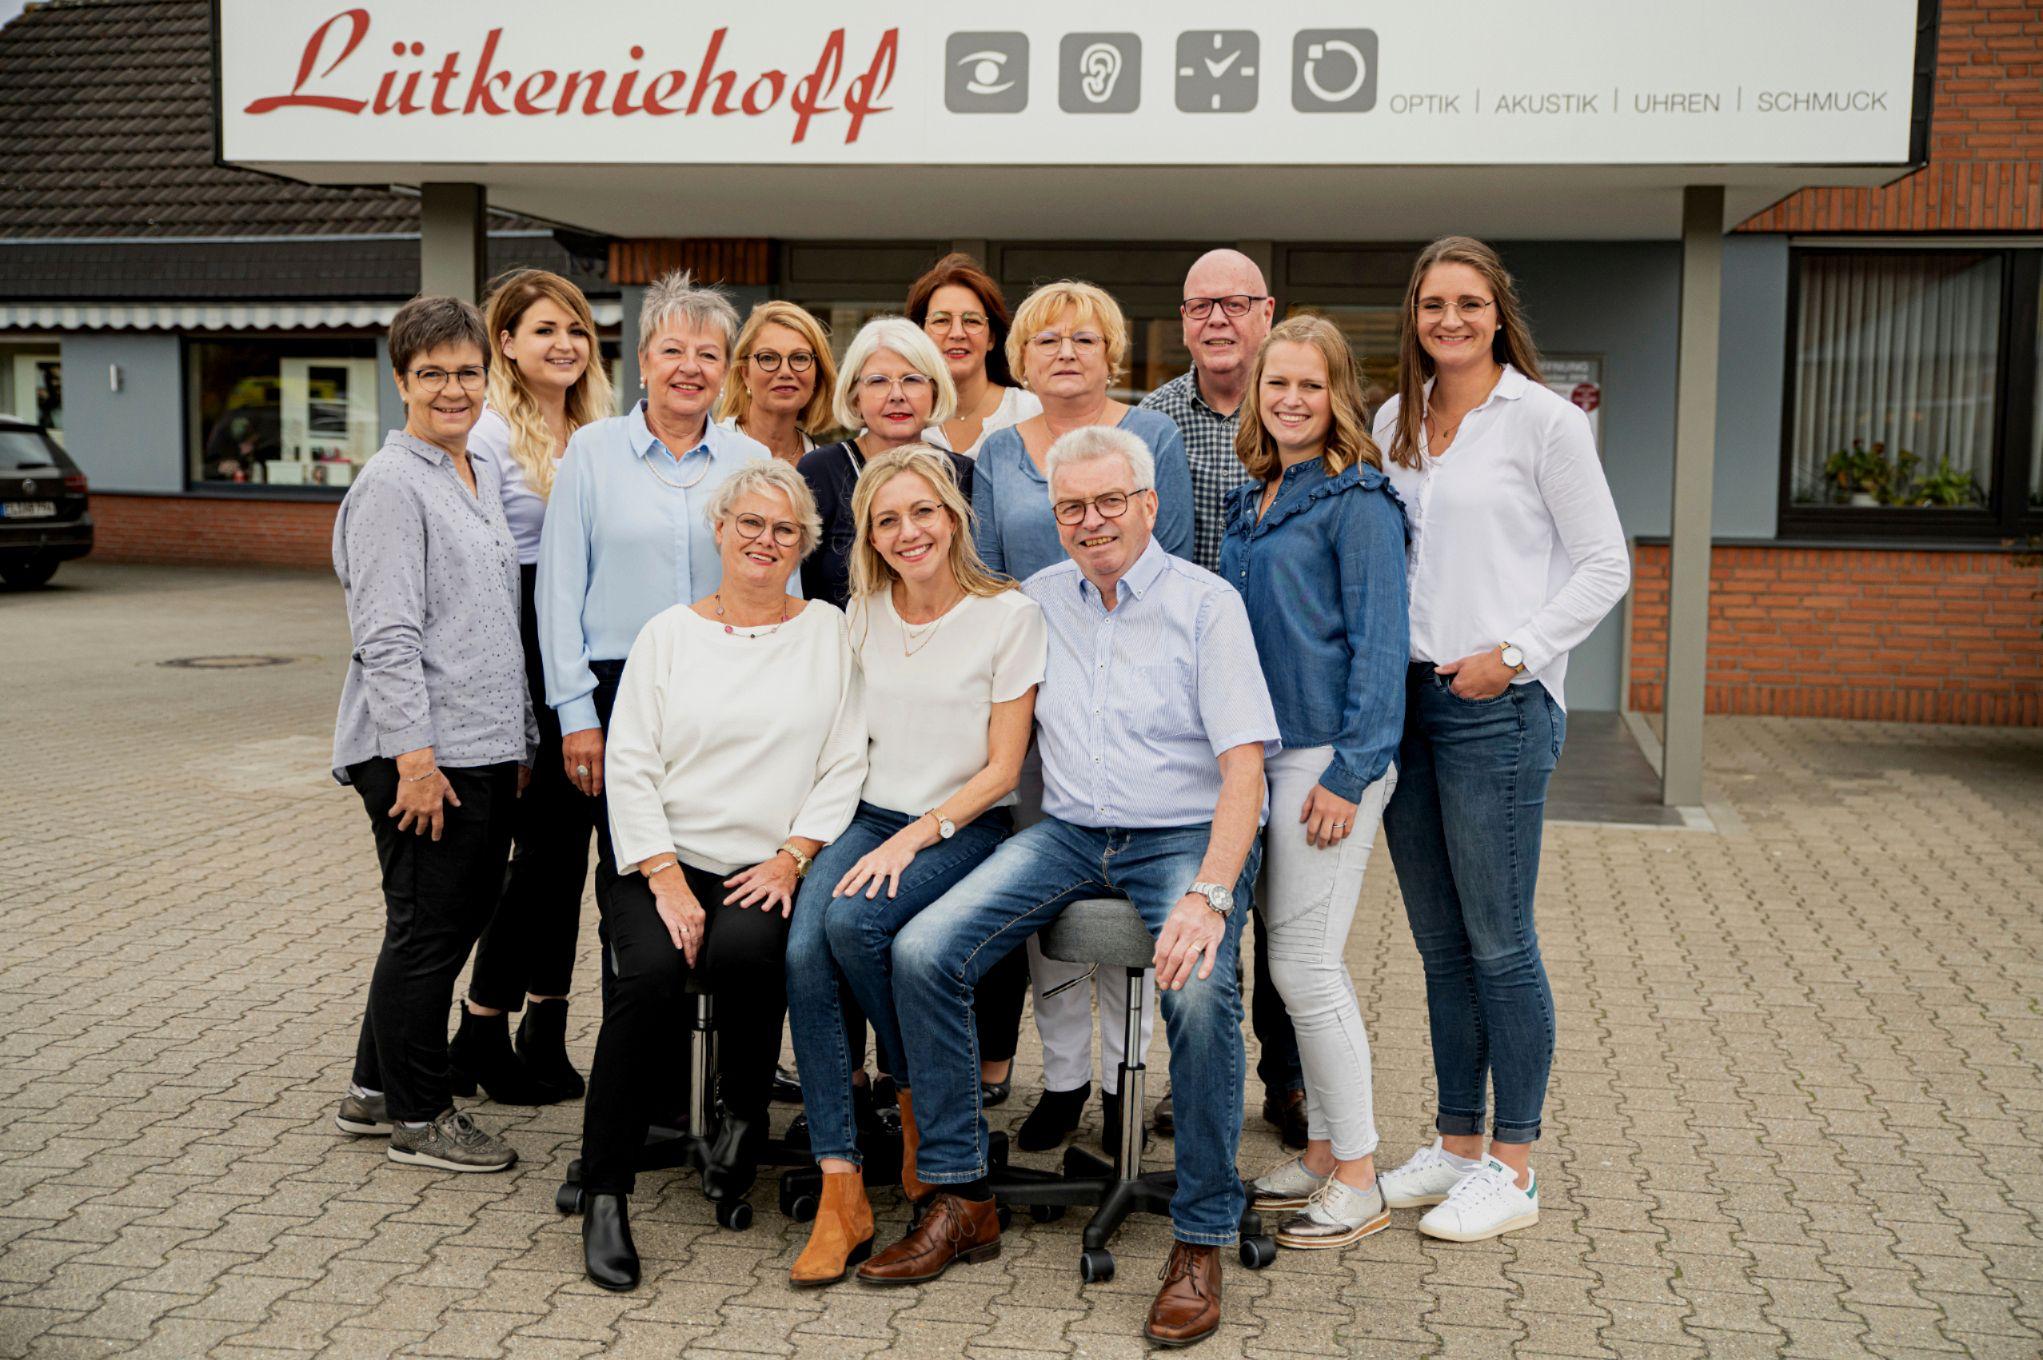 Optik-Akustik-Uhren-Schmuck Lütkeniehoff